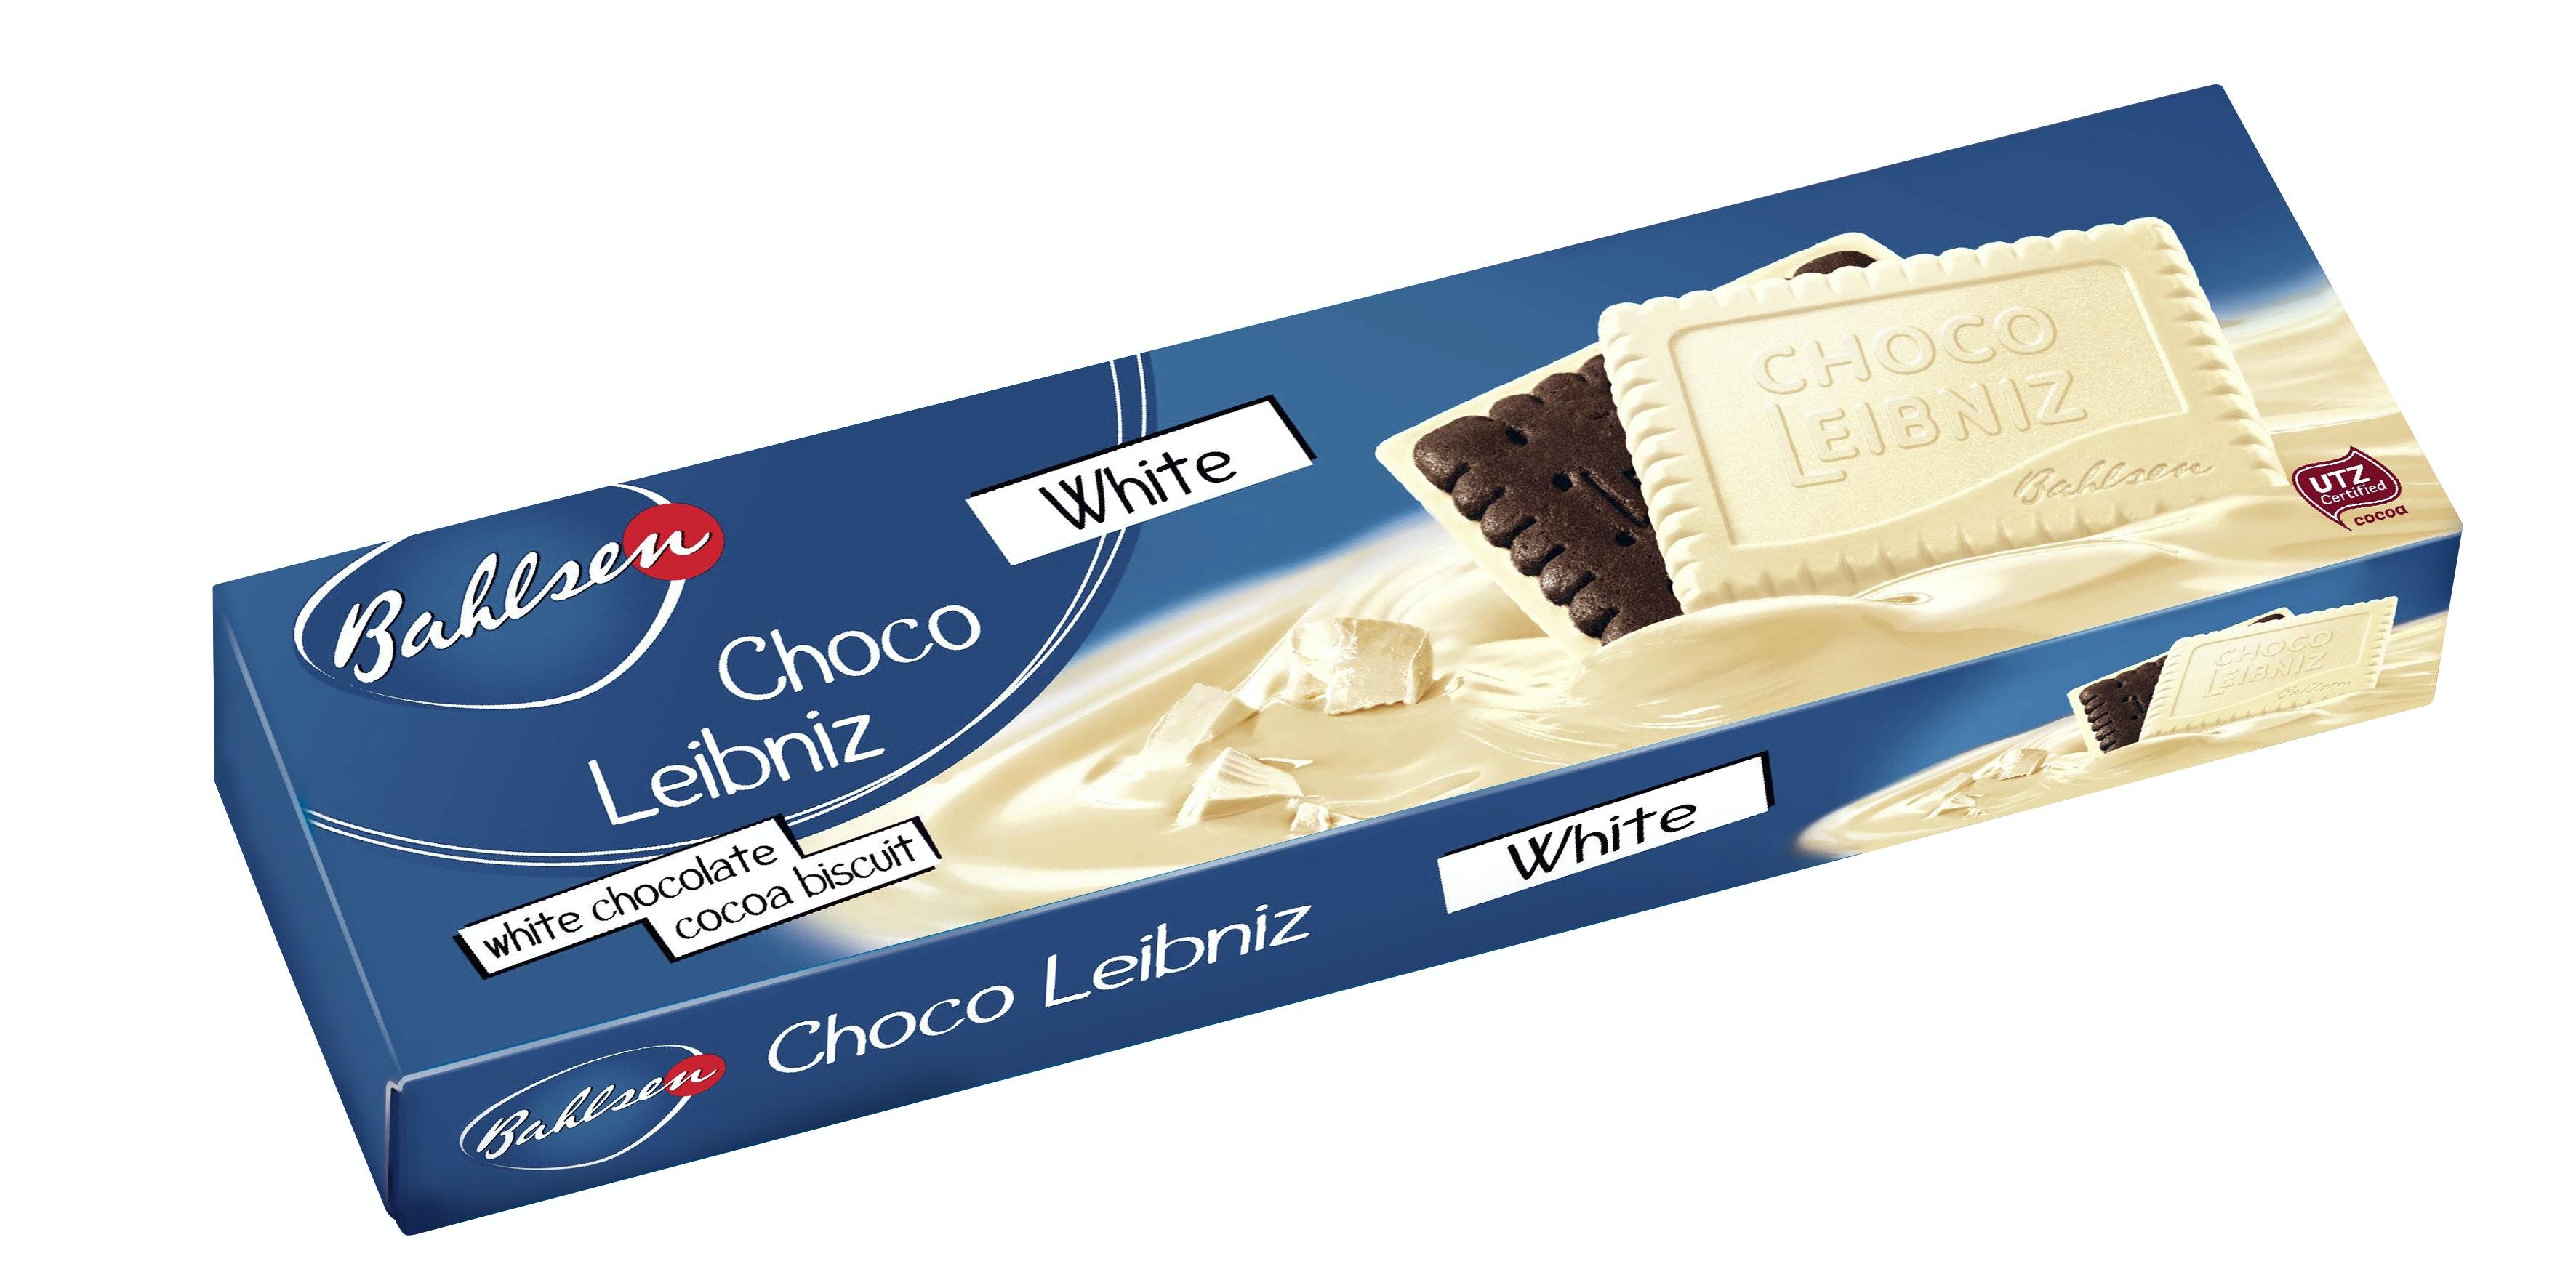 Bahlsen choco leibniz white